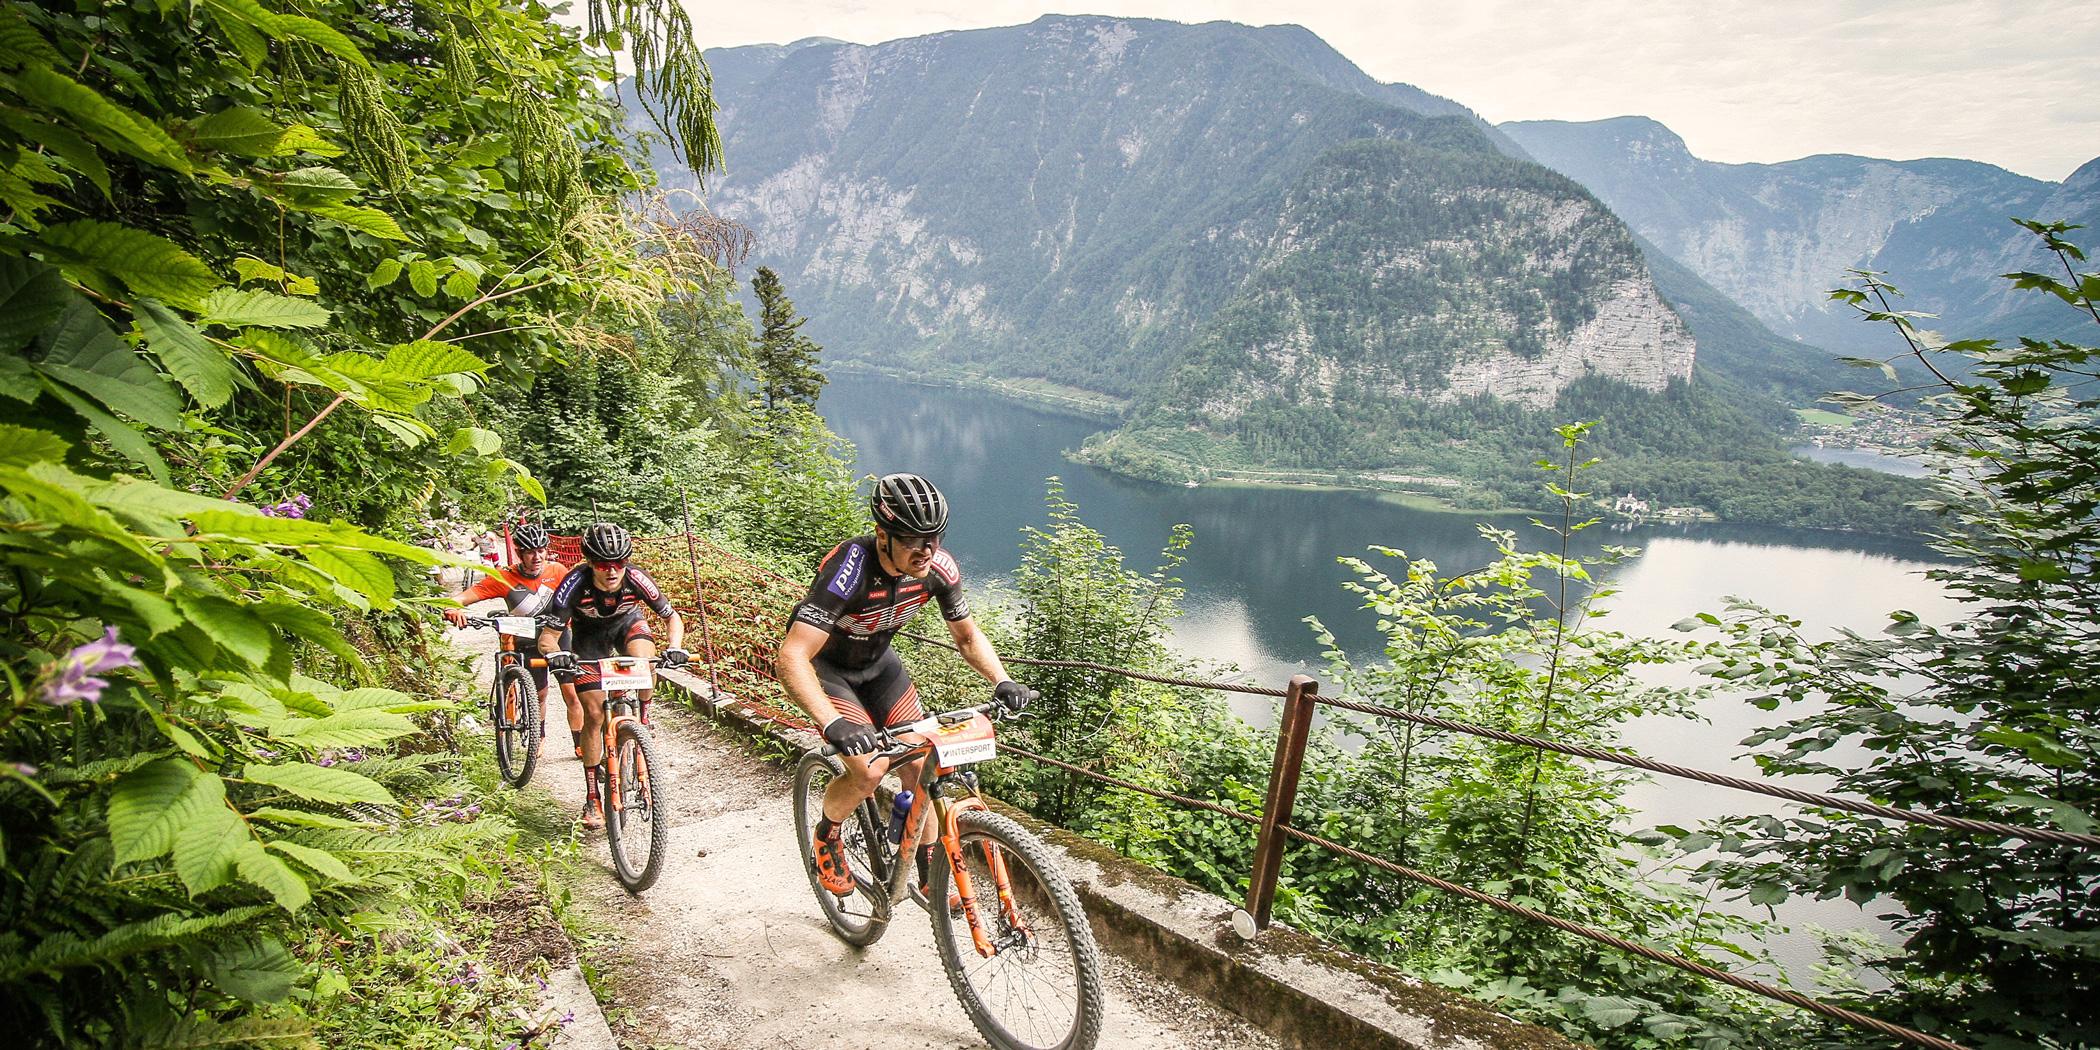 Salzkammergut Mountainbike Trophy 2018 - Salzberg Hallstatt (Foto: sportograf)